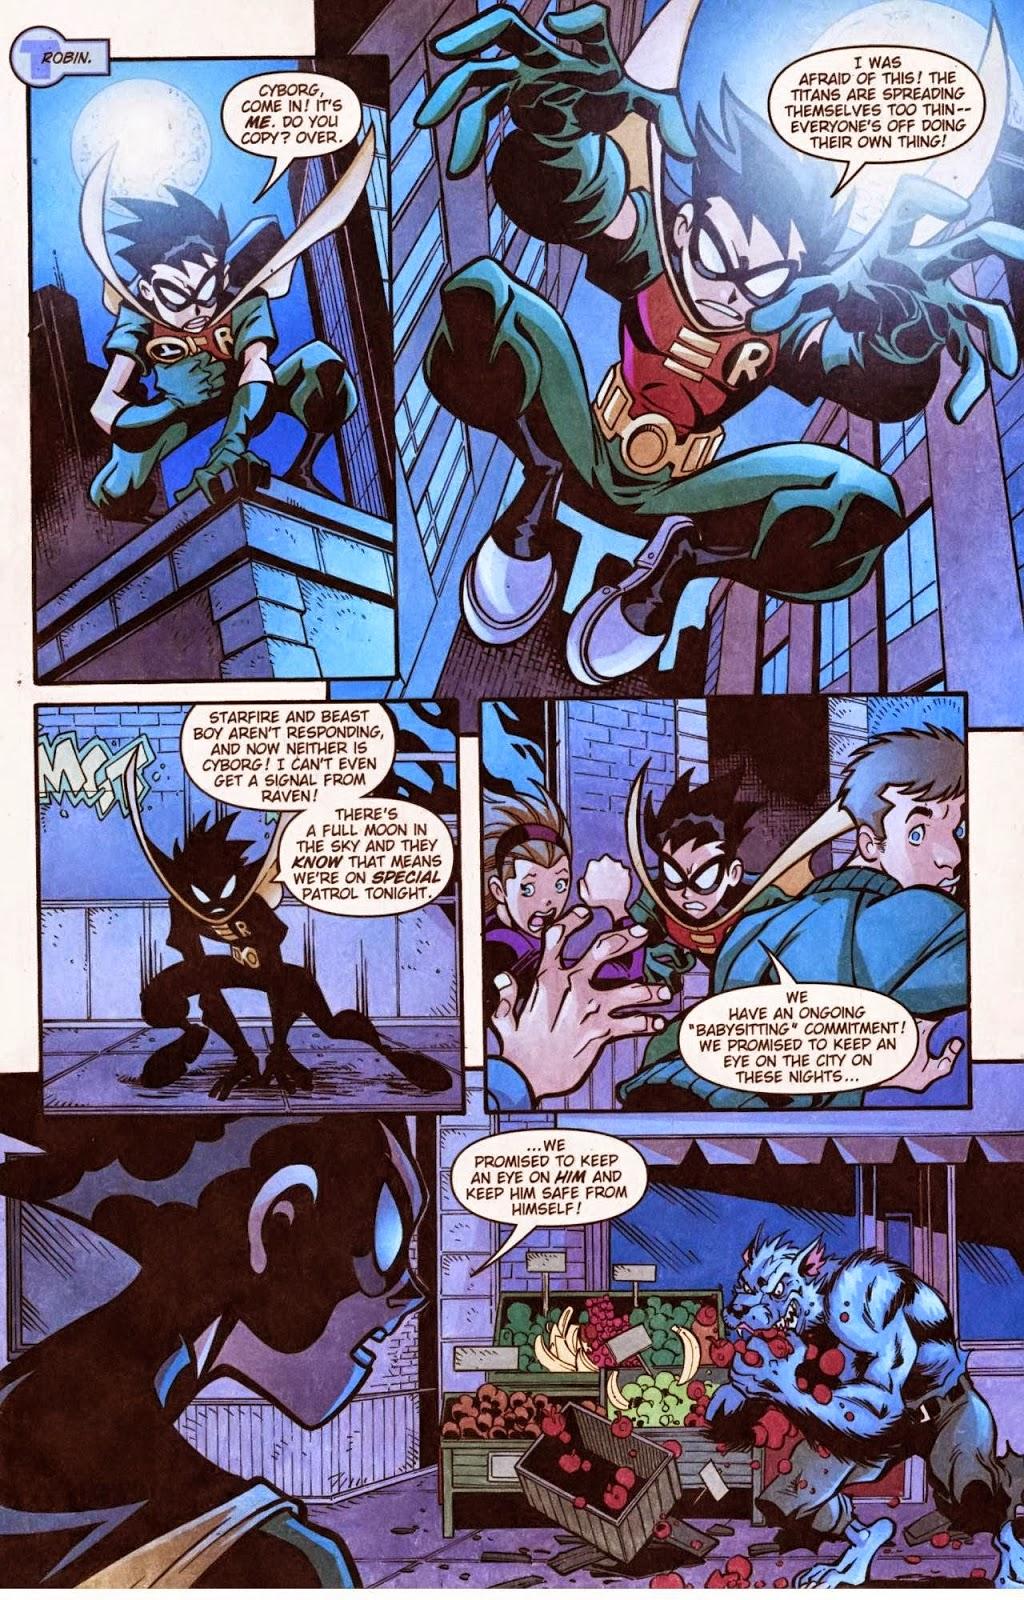 teen-titans-go-comic-online-marina-sirtis-cumshot